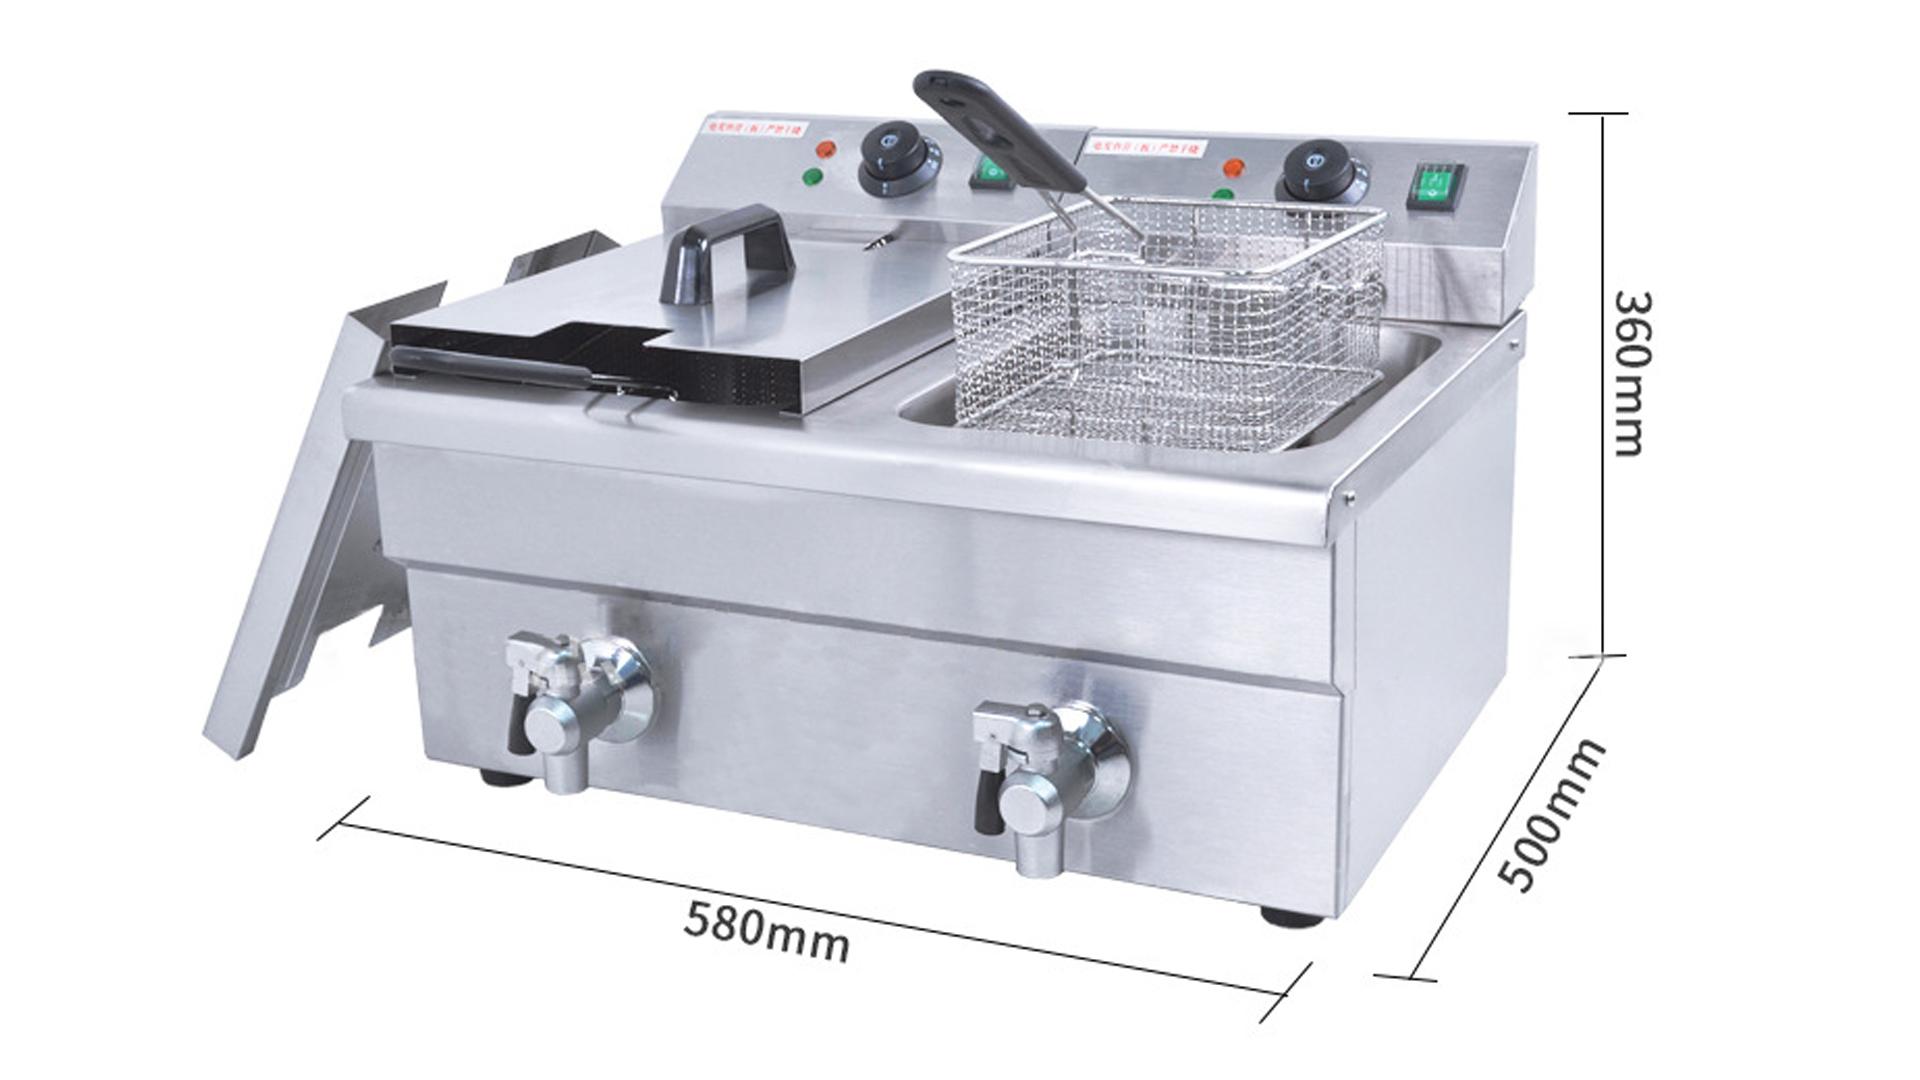 Benchu電動商用雙缸雙屏電動油炸鍋FY-6LFE / 2炸鍋炸薯條炸雞翼設備